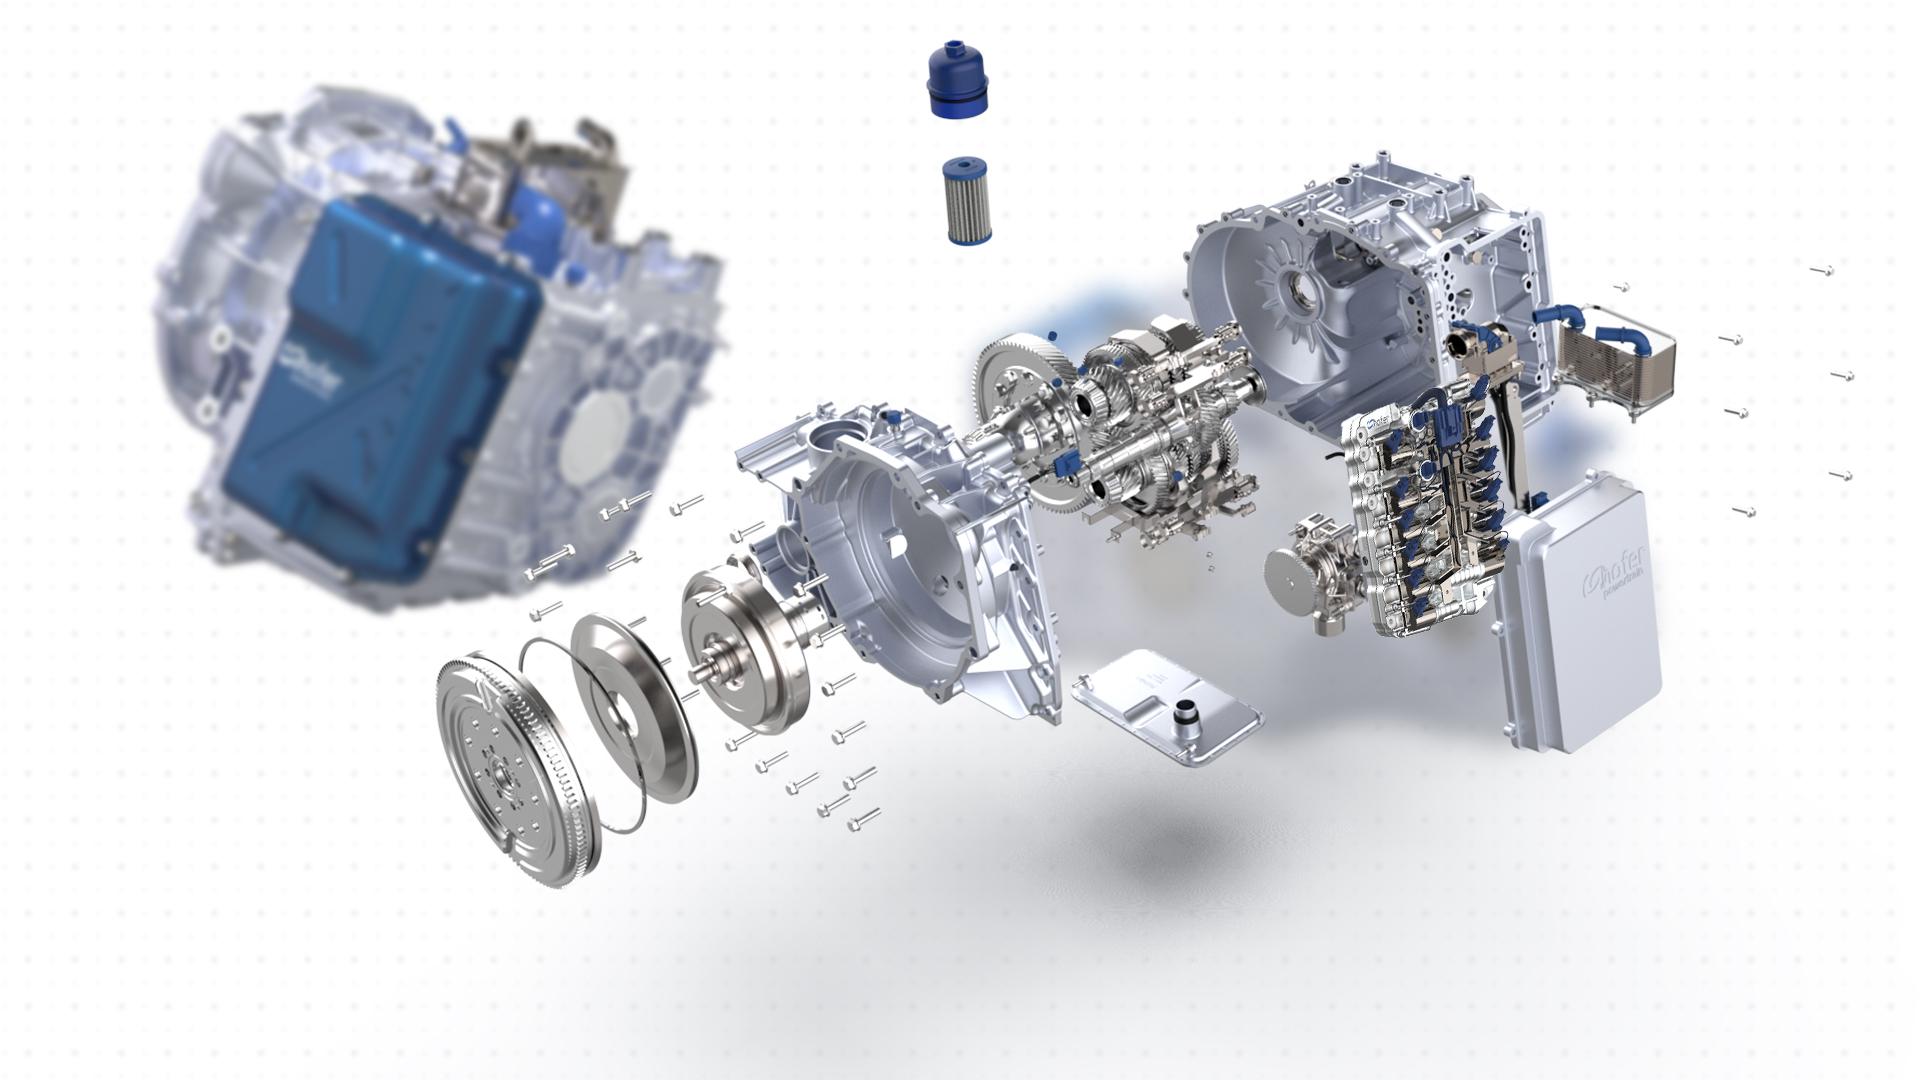 dual clutch transmission solutions by hofer powertrain, complete development, service, DCT